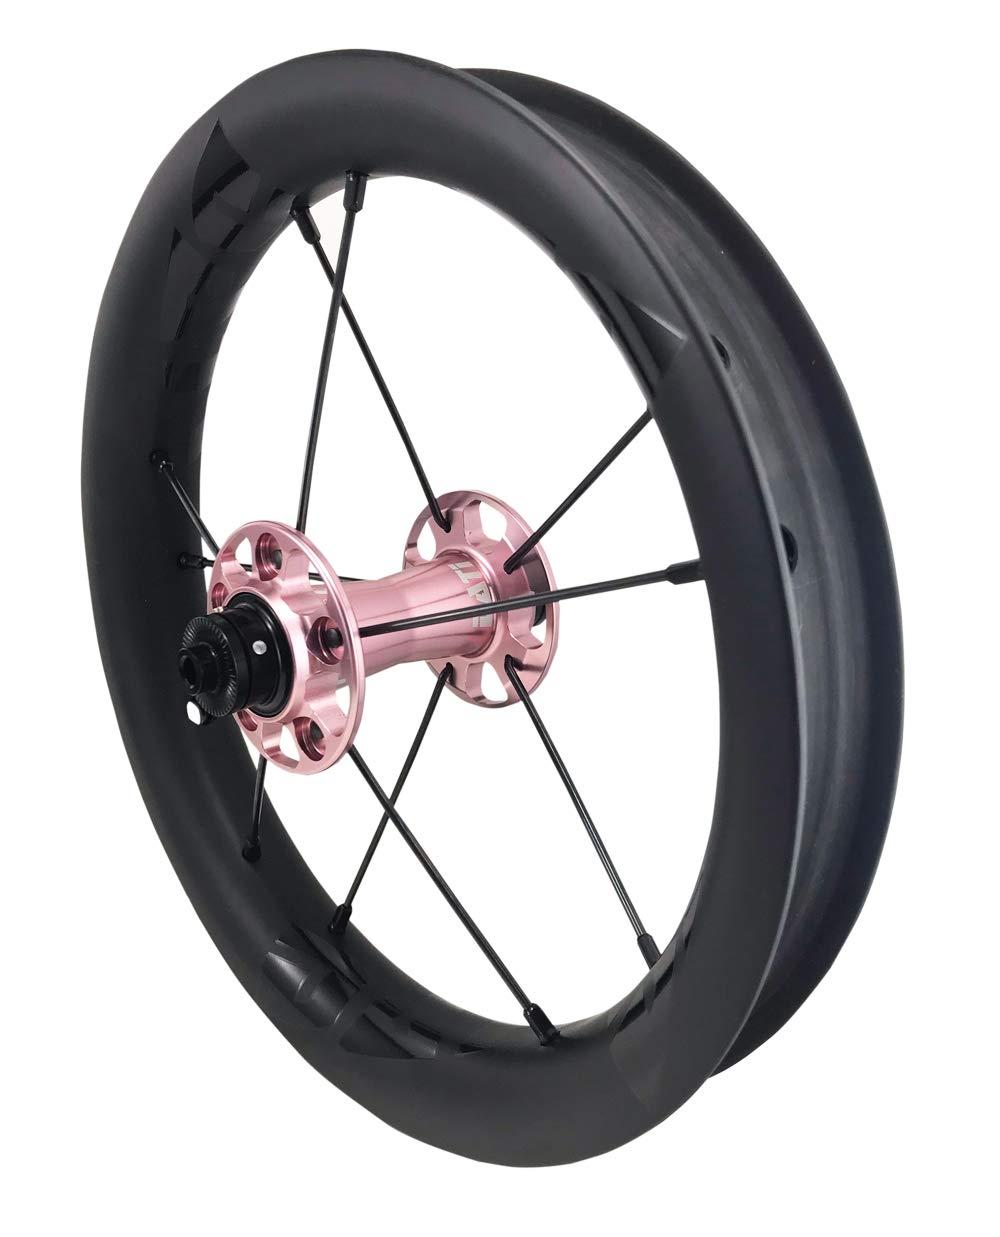 DATI 12インチ S8C-SCW Race series professional (炭素繊維 リム) レース レベル. 低抵抗.スムーズ.バランスバイク Kids Balance Bike Bicycle Super light 子供自転車ホイール 204g/wheel B07LCMHN3M BIXBI PUKY: 90*10MM Pink/Black logo Pink/Black logo BIXBI PUKY: 90*10MM